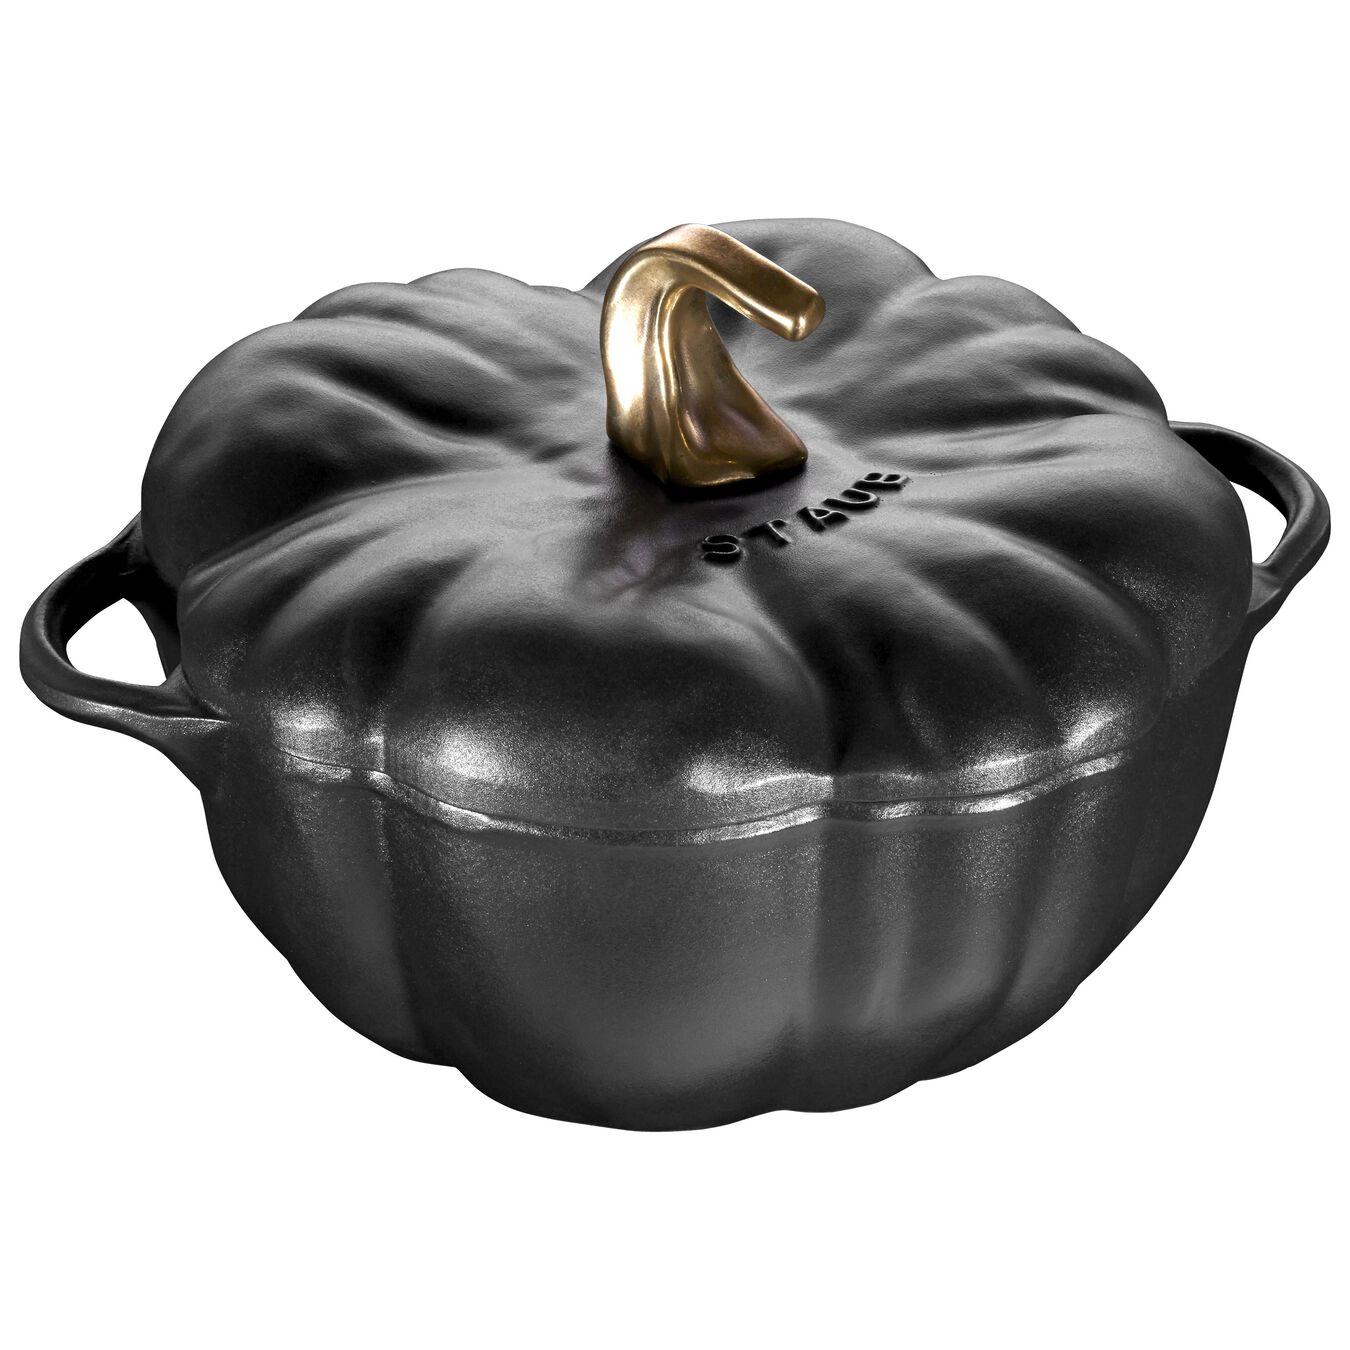 Caçarola 24 cm, pumpkin, Preto, Ferro fundido,,large 1